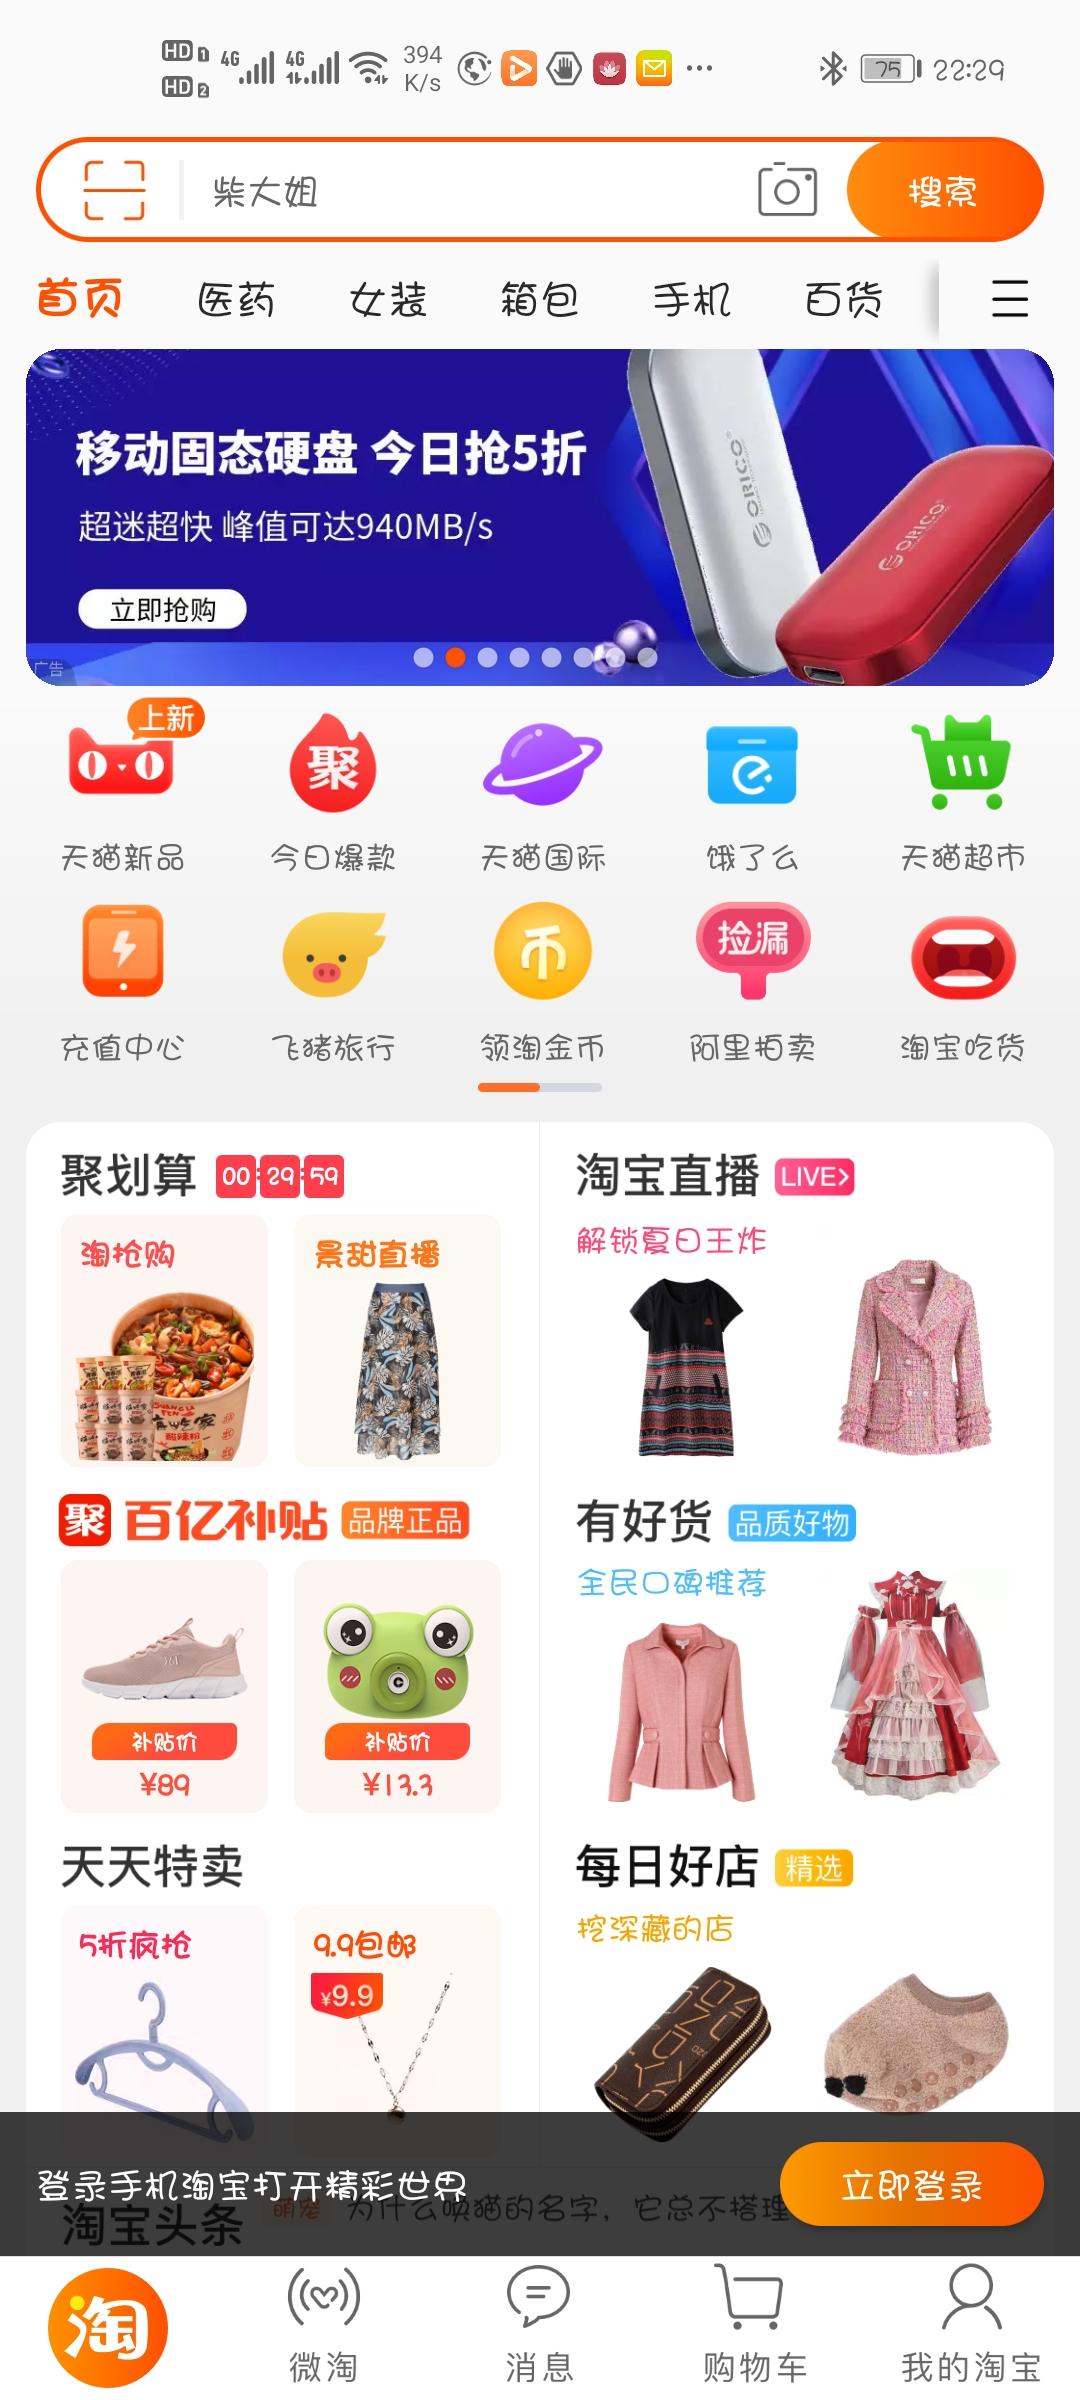 Screenshot_20200821_222959_com.taobao.taobao.jpg